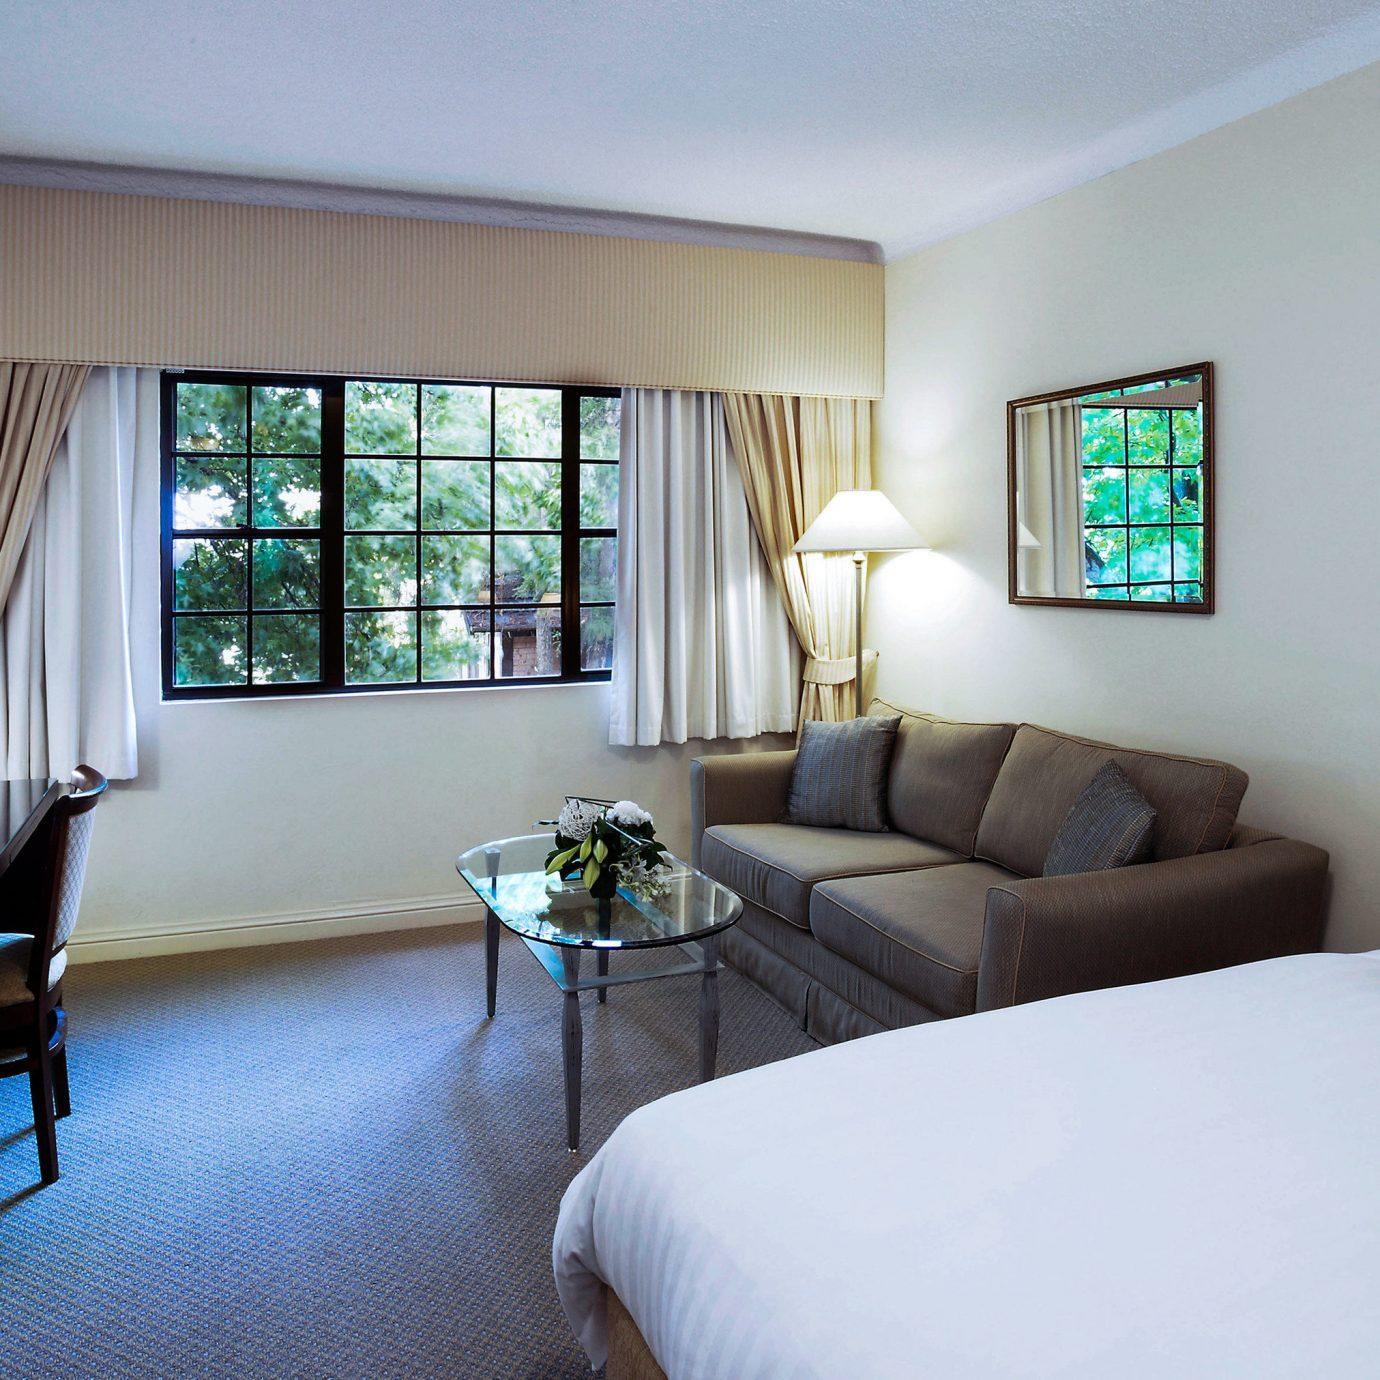 sofa property living room home Suite condominium cottage Villa Bedroom flat containing